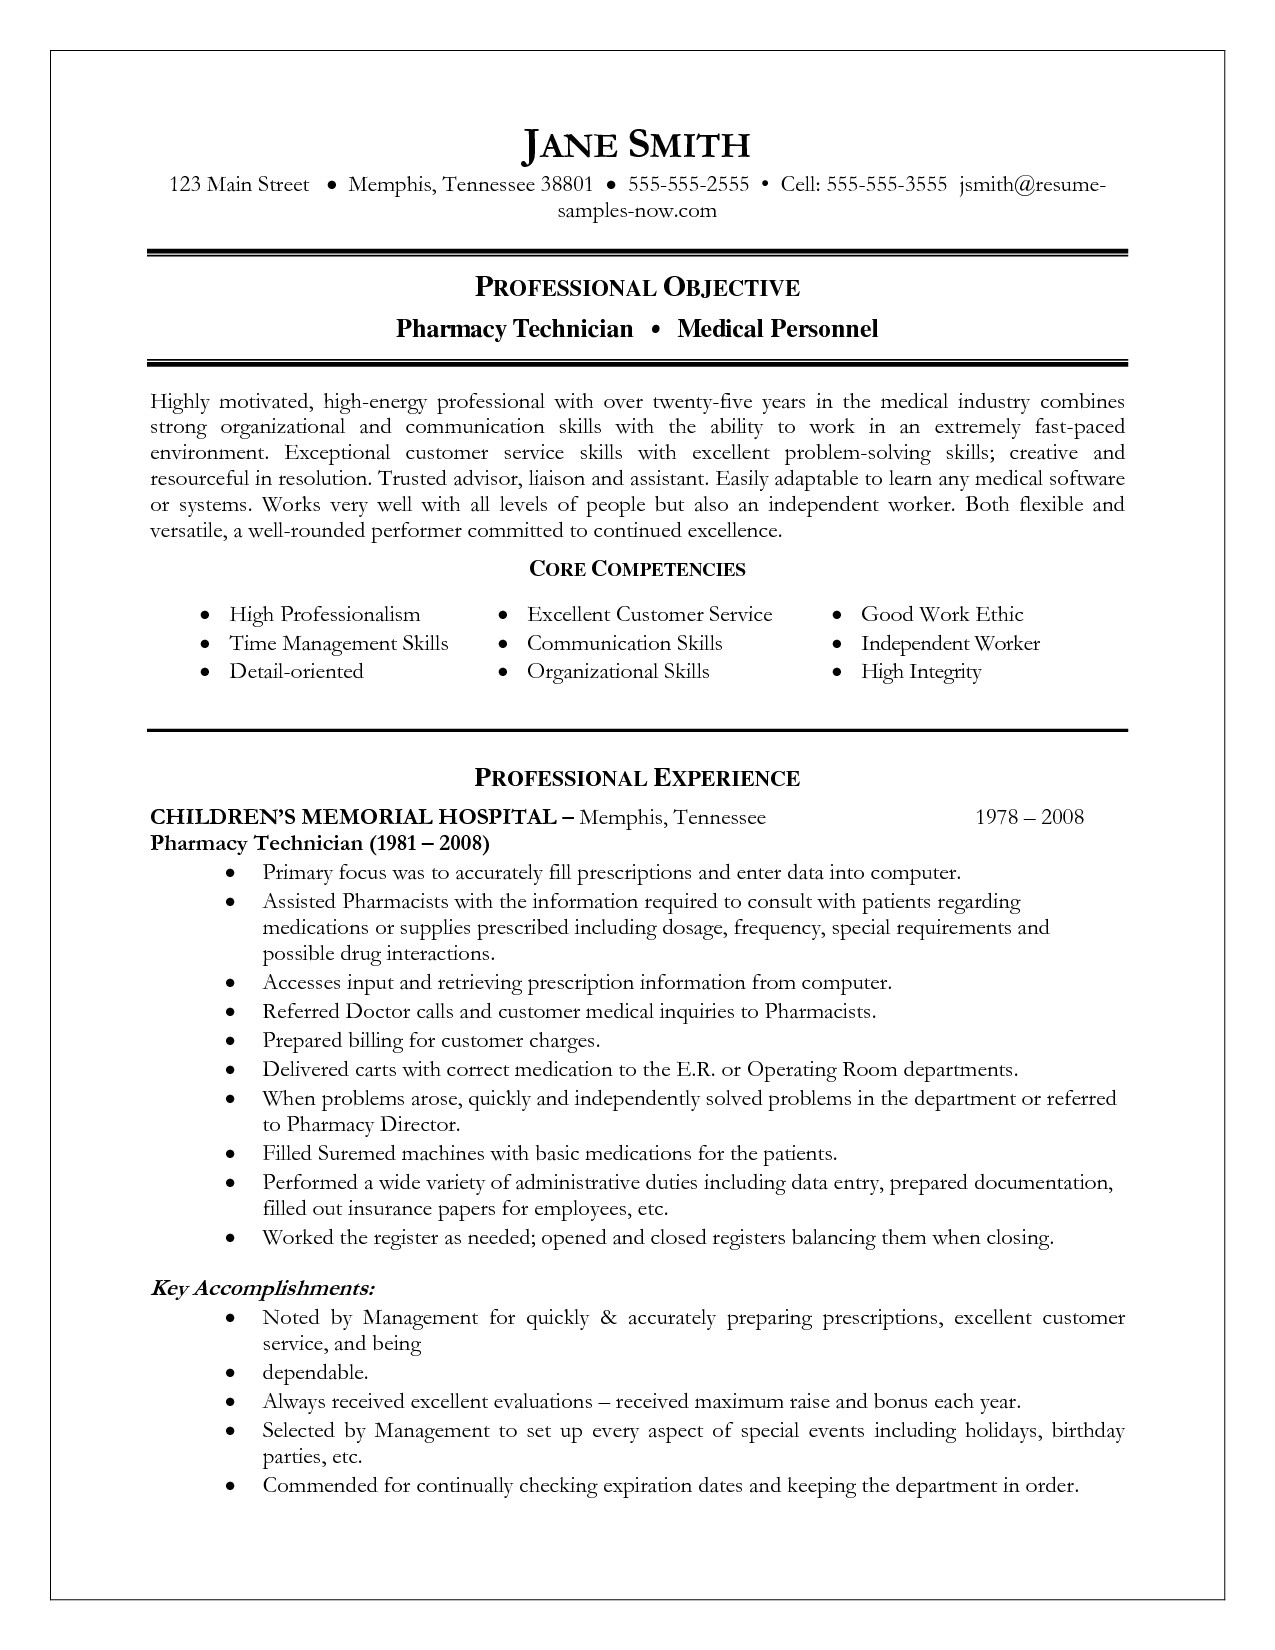 Sample Resumes for Pharmacy Technicians Resume Example Pharmacy Technician Examples format for